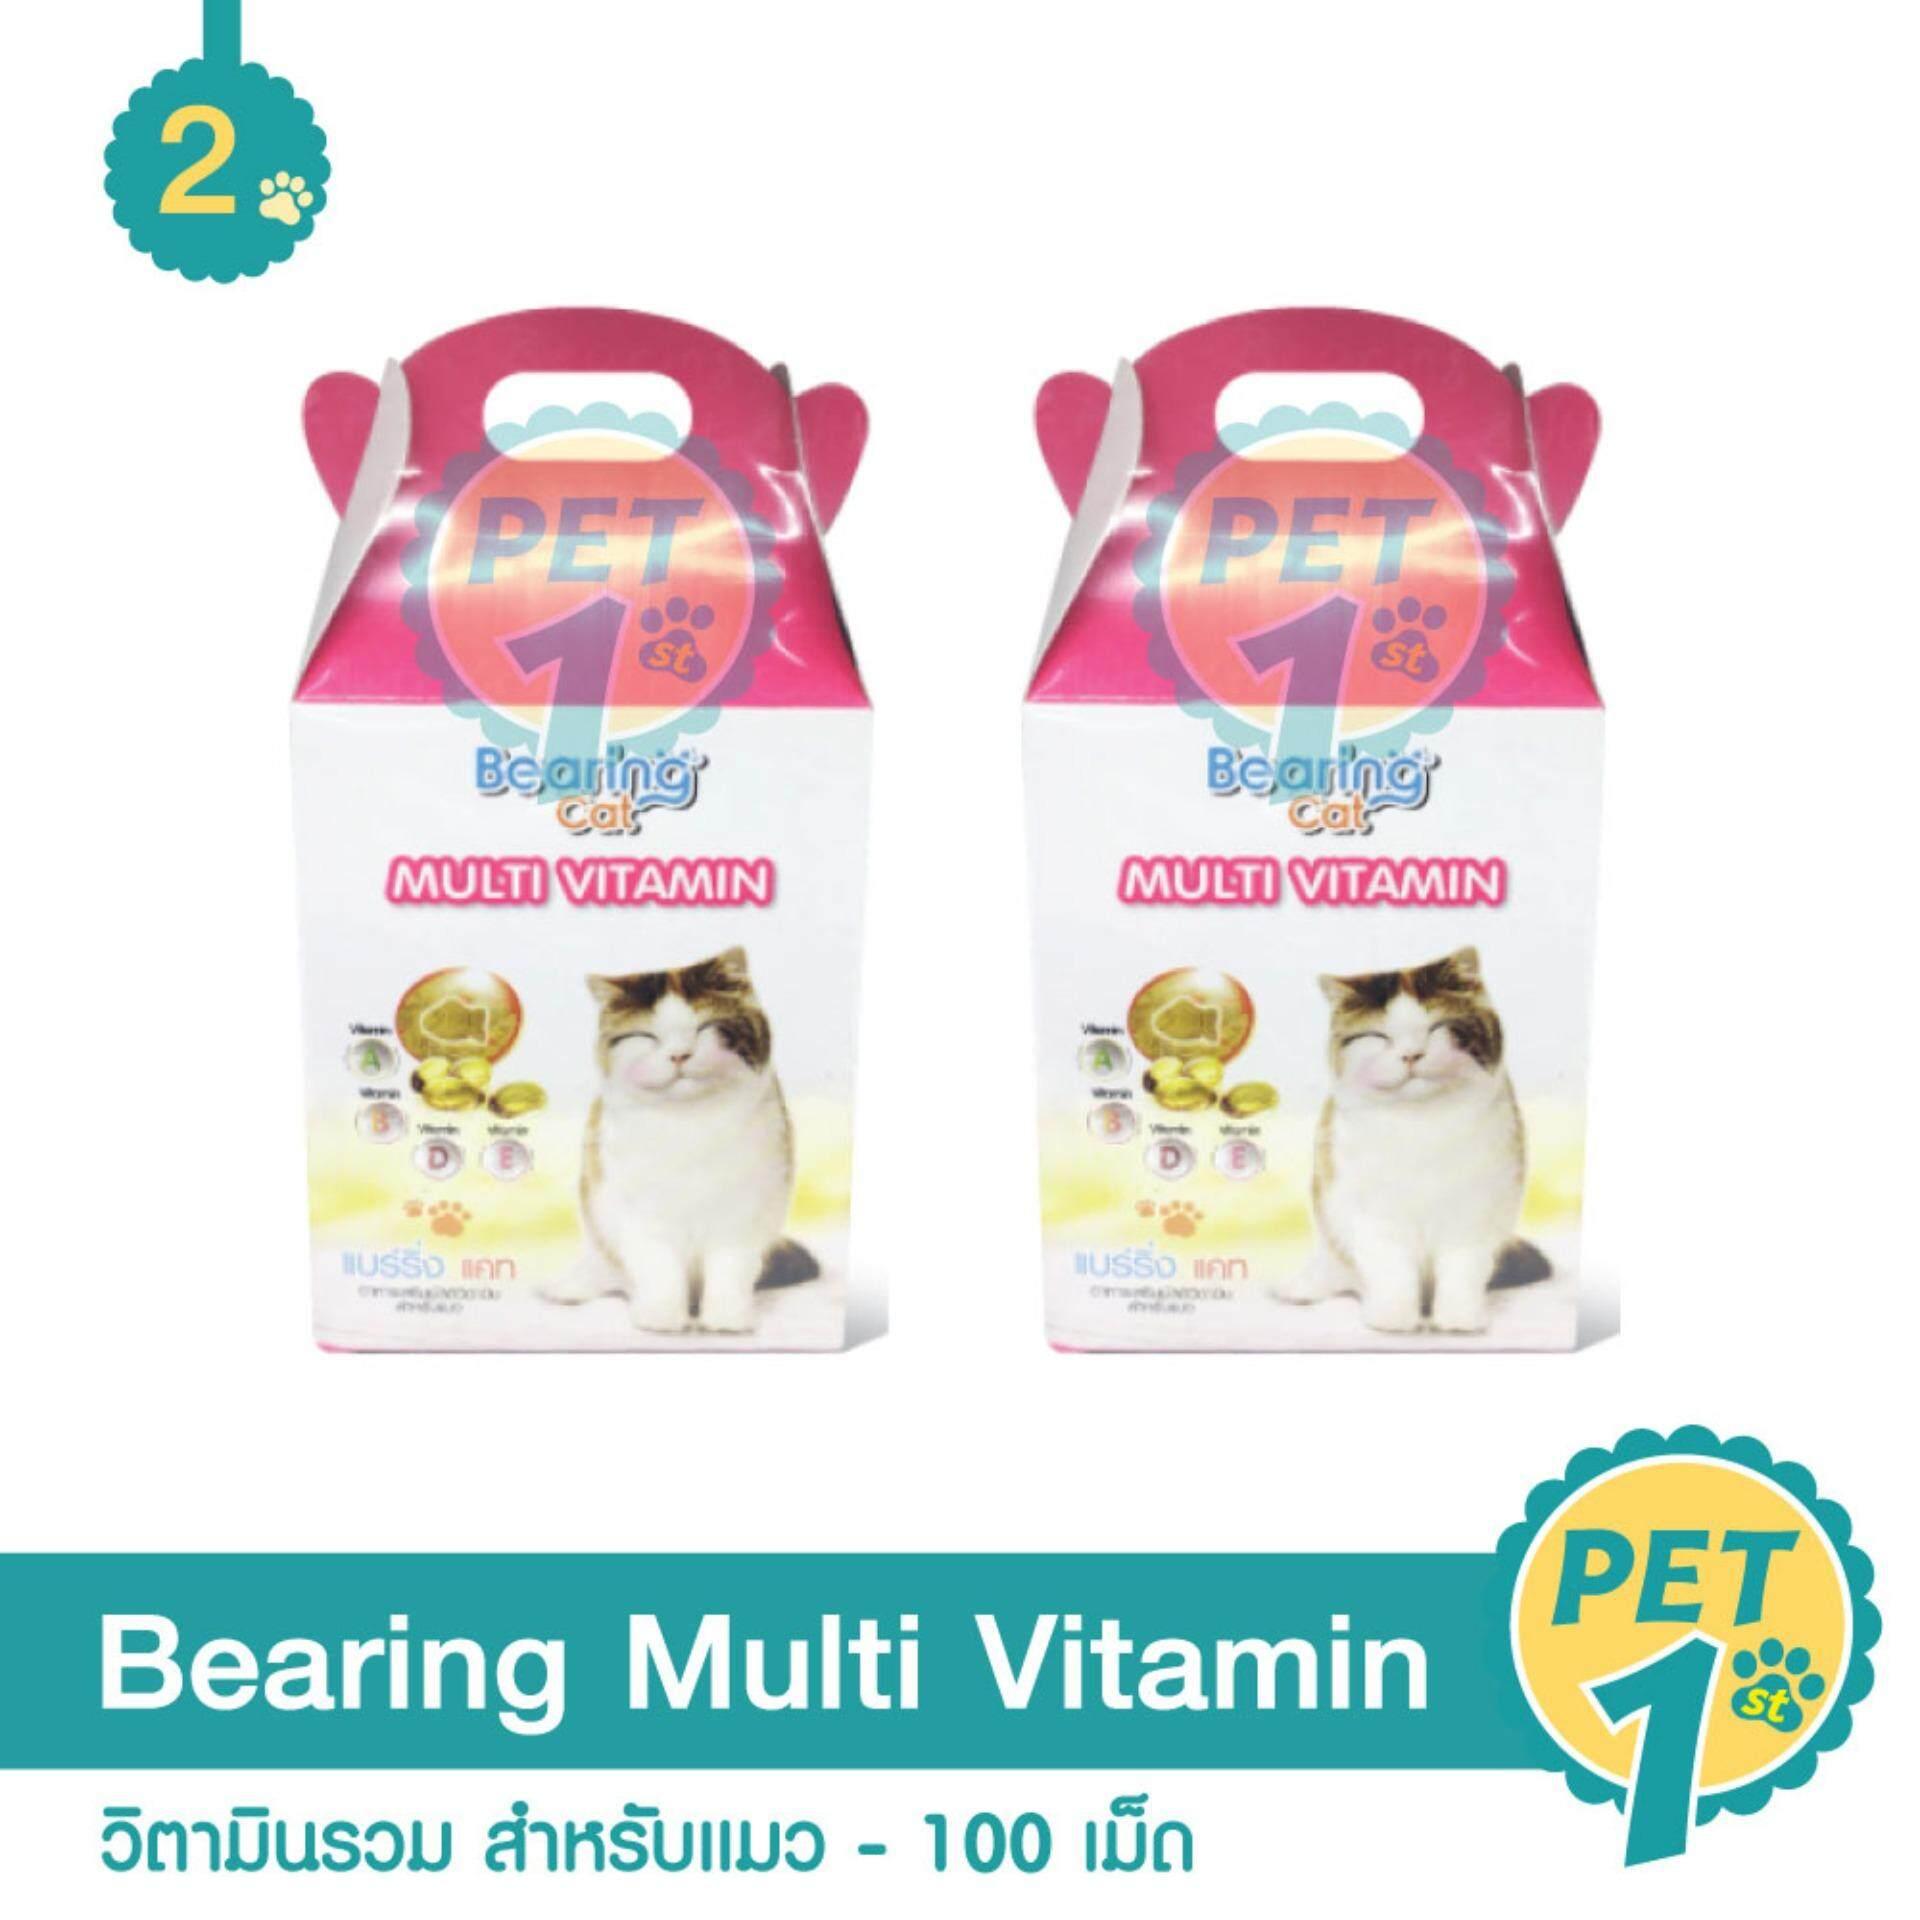 Bearing Multi Vitamin วิตามินรวม สำหรับแมว 100 เม็ด - 2 กล่อง By Pet First.